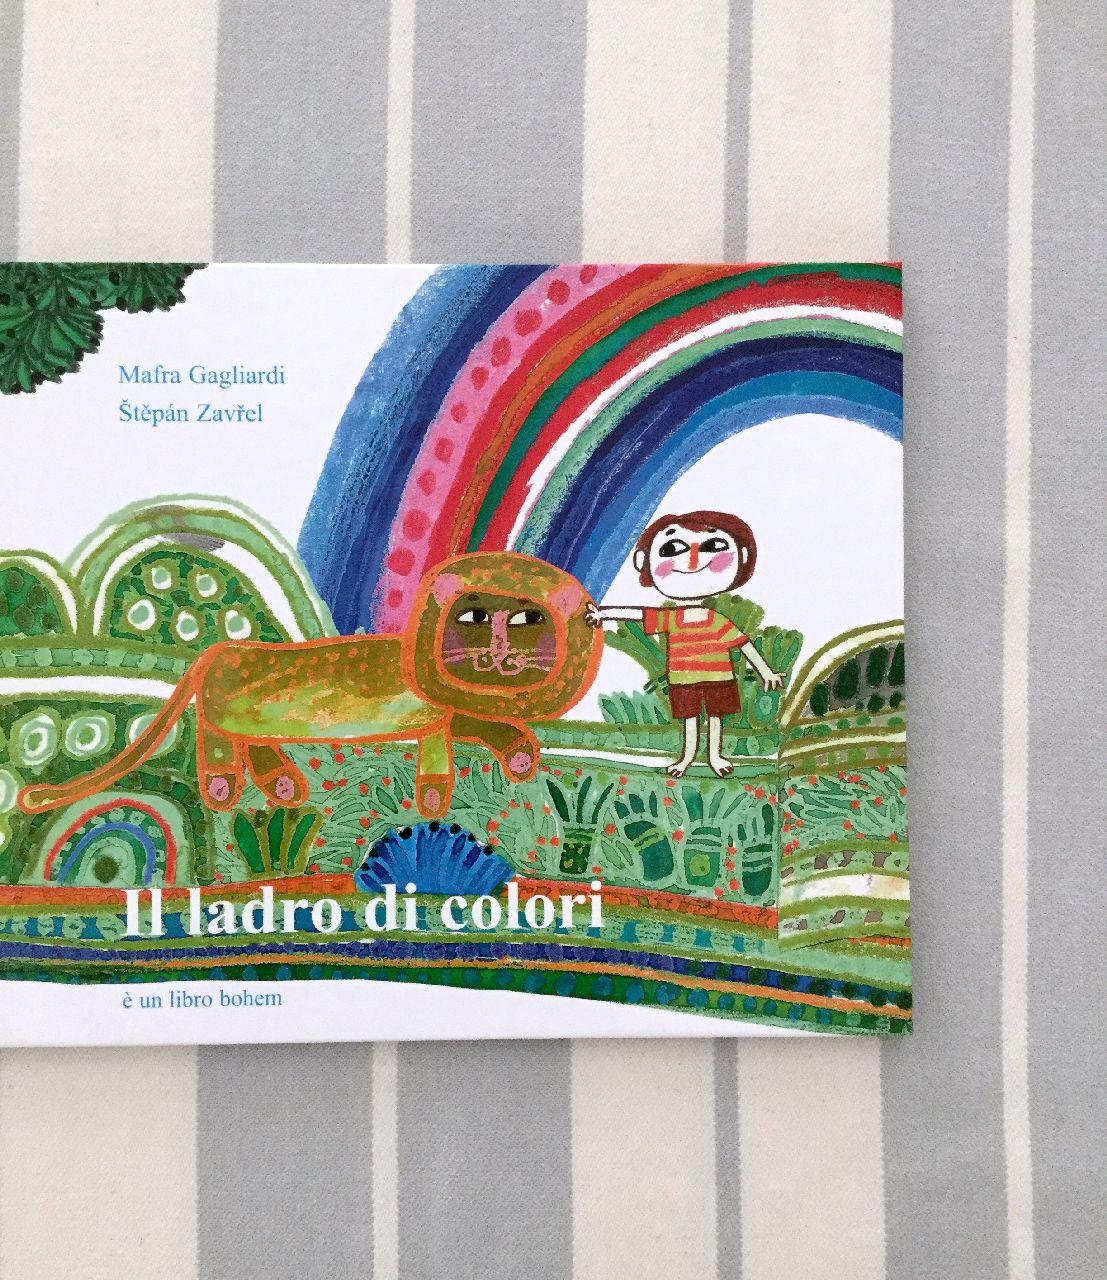 Mafra Gagliardi - Štepán Zavrel, Il ladro di colori, Bohem